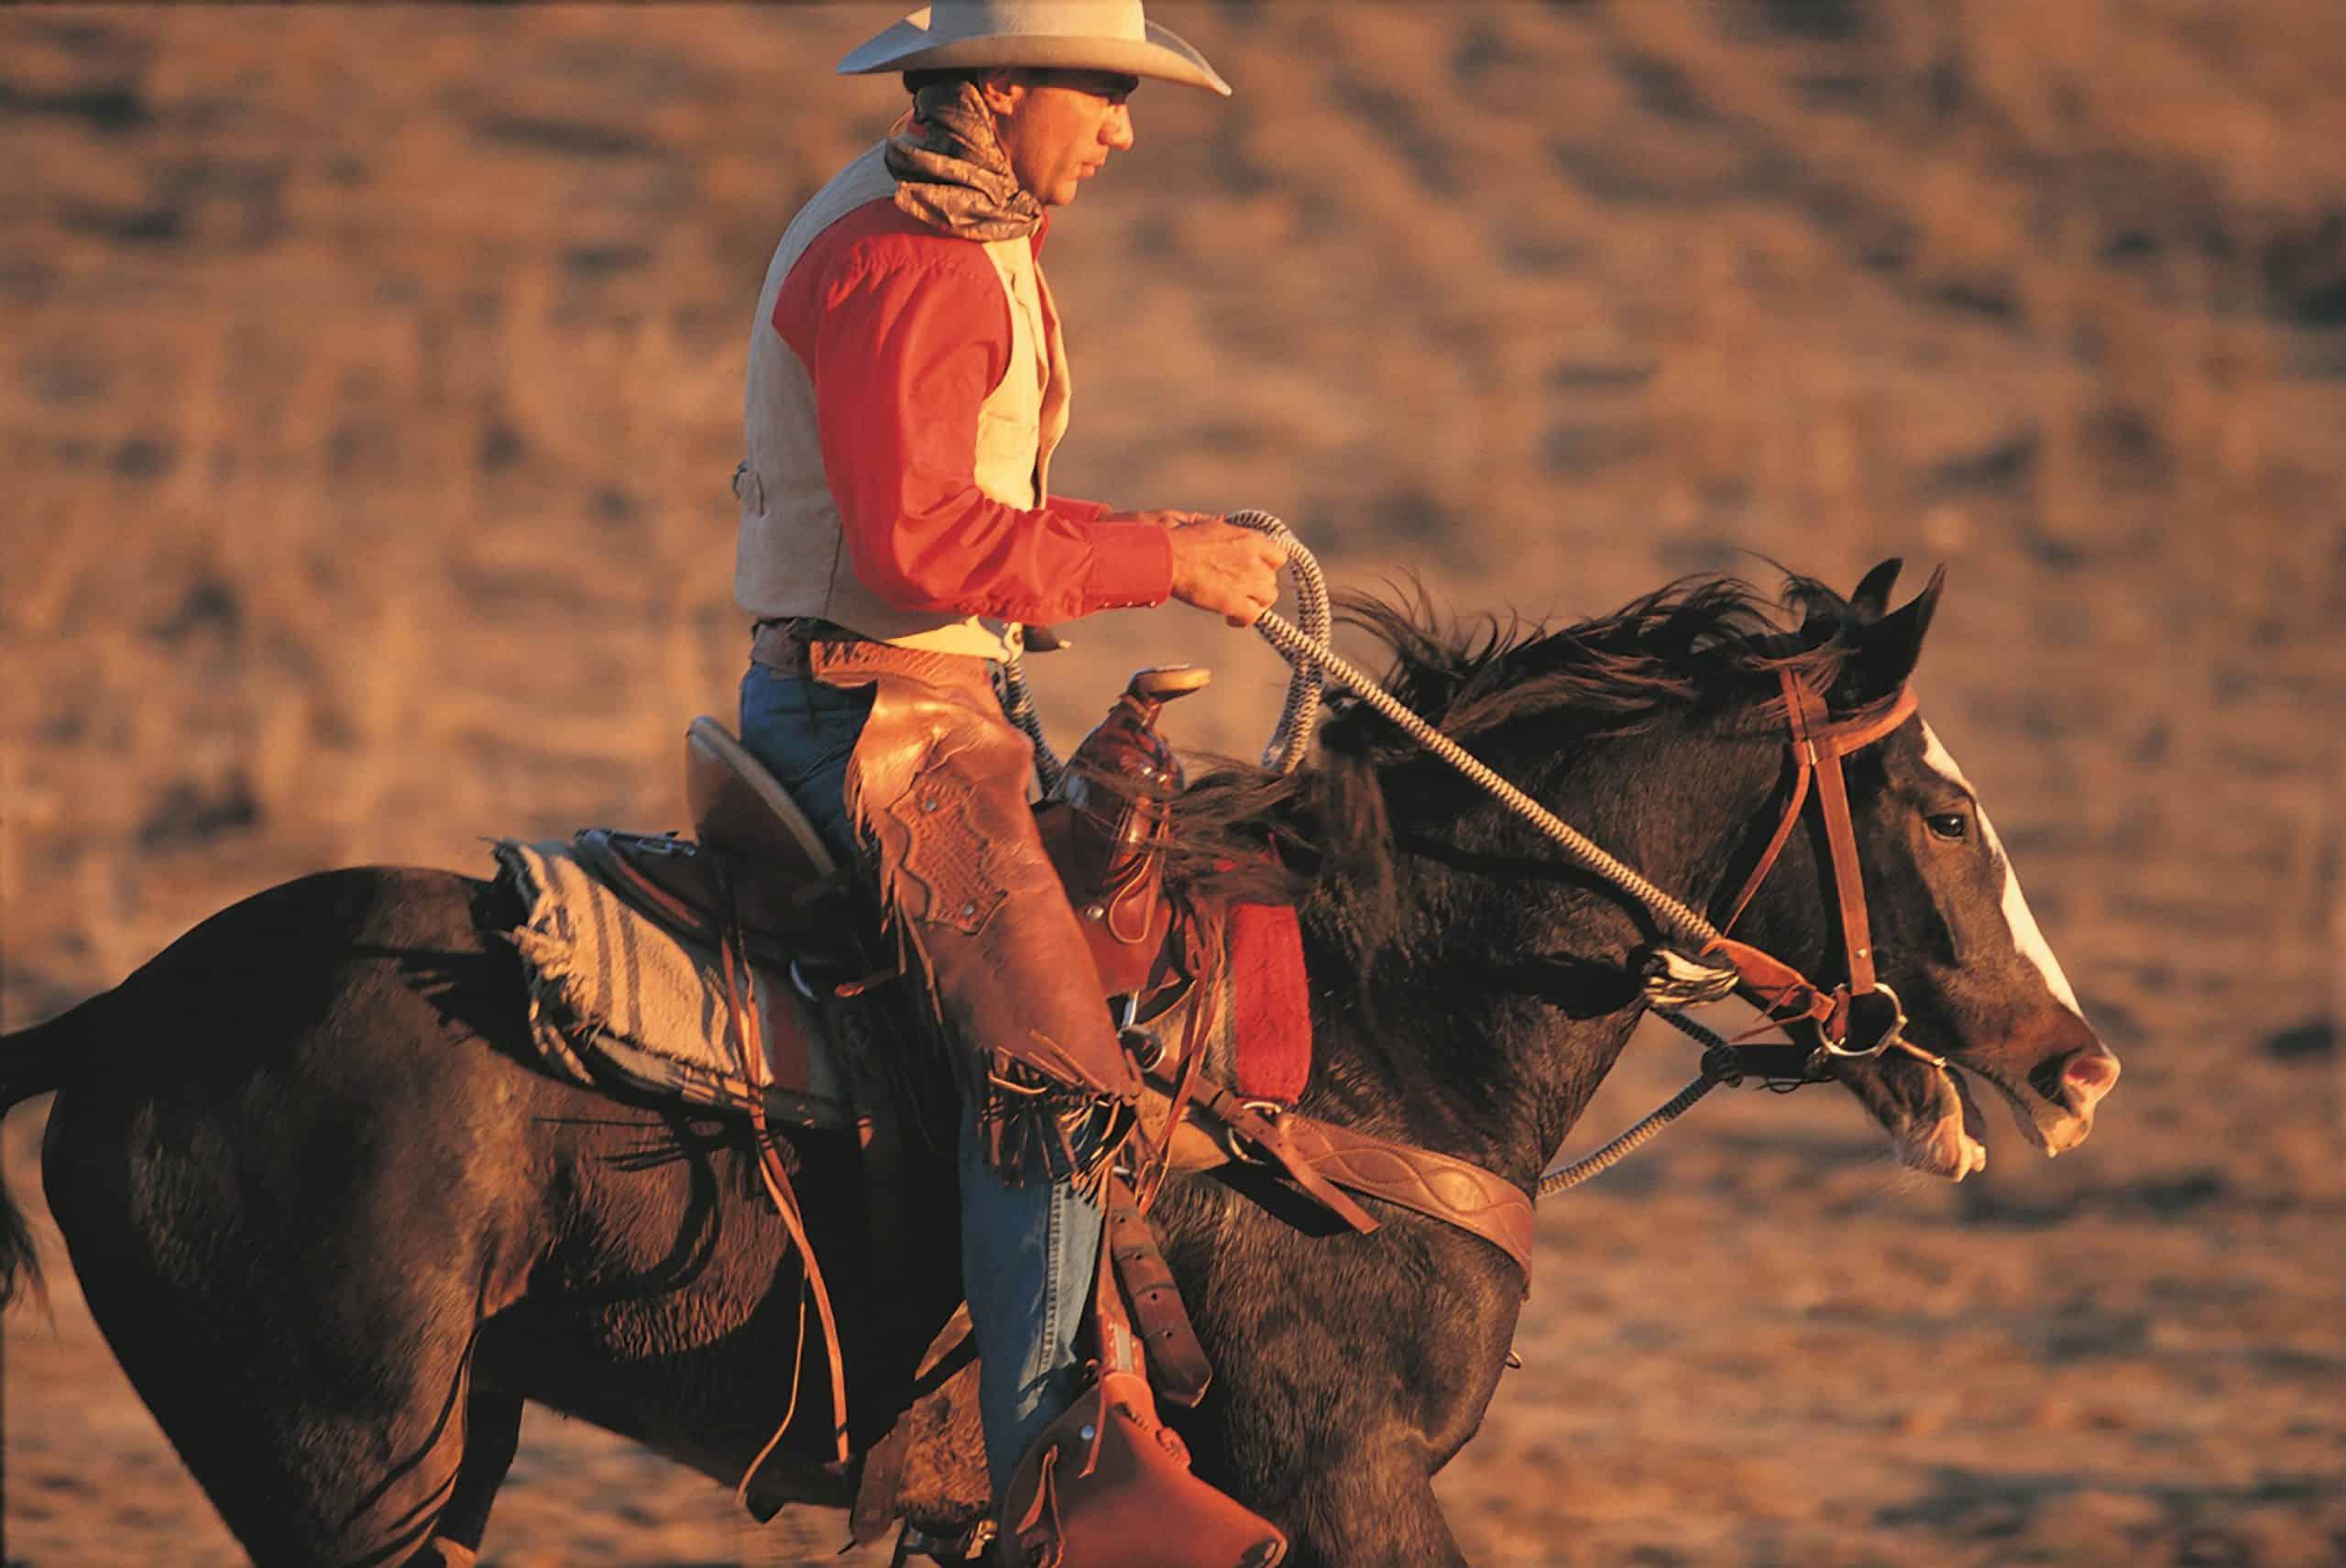 horseback reining